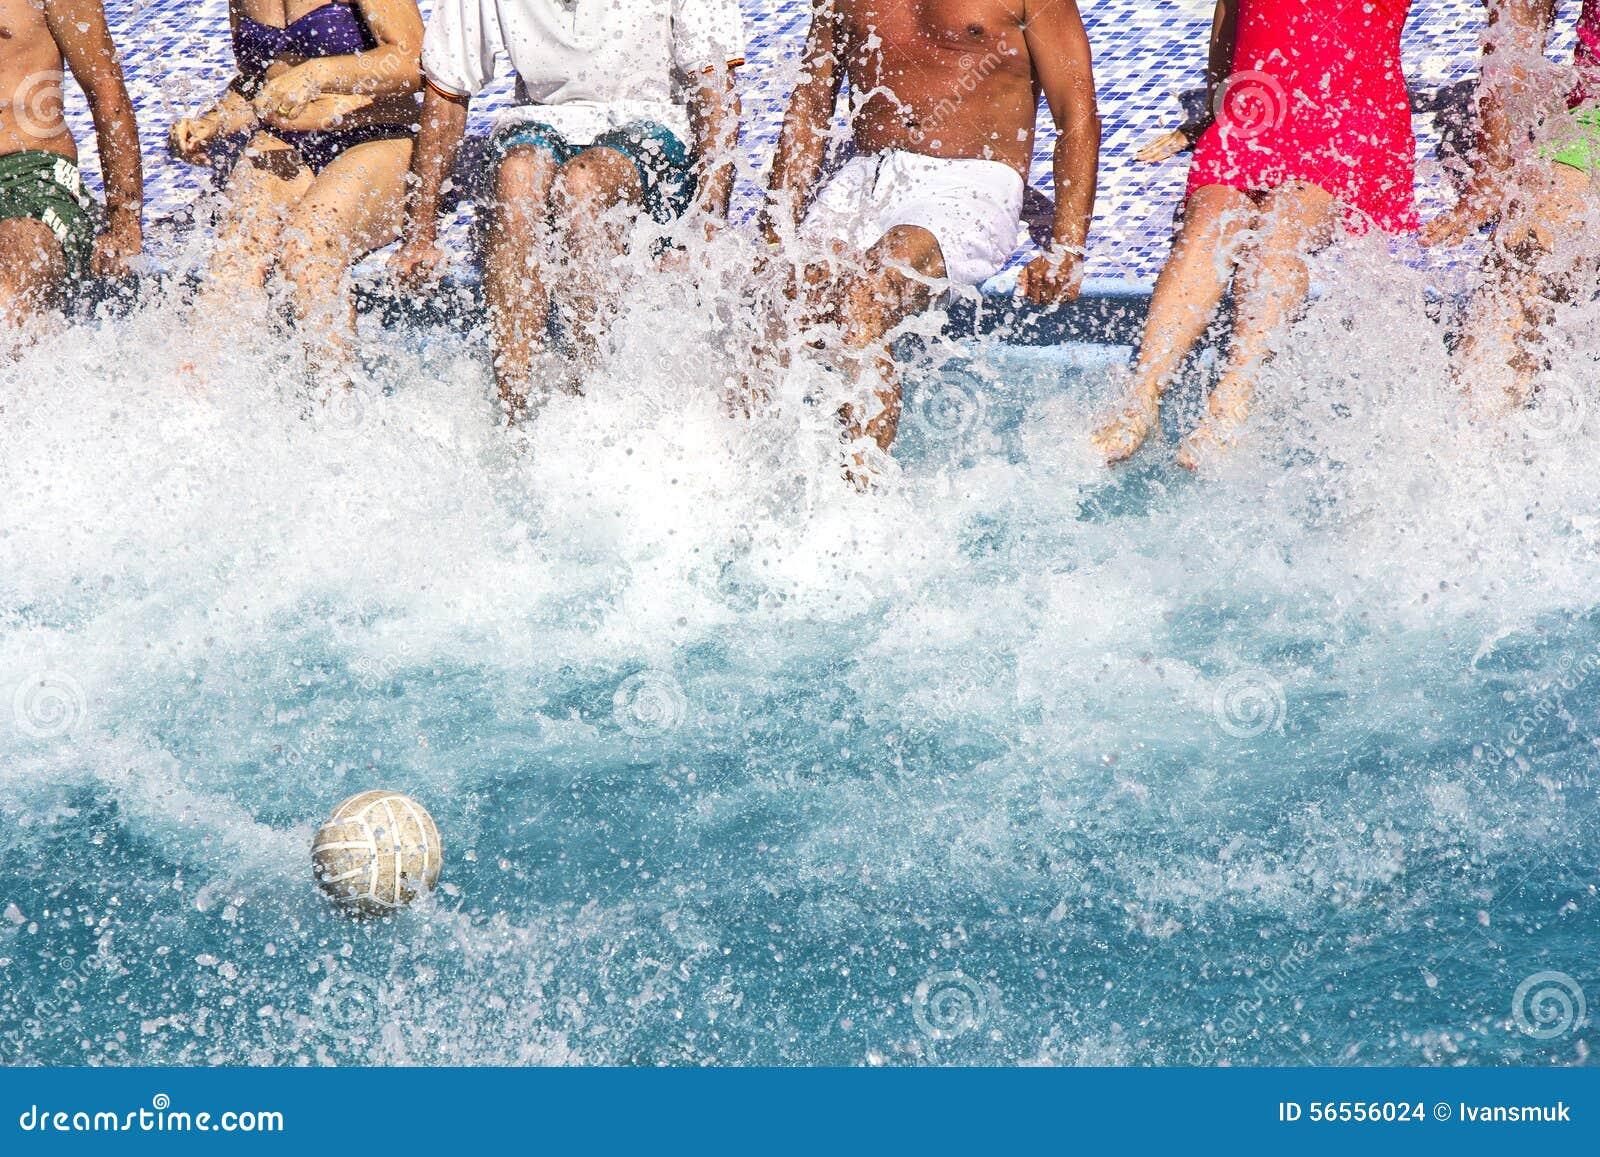 Download λίμνη διασκέδασης στοκ εικόνες. εικόνα από φιλία, άνθρωποι - 56556024